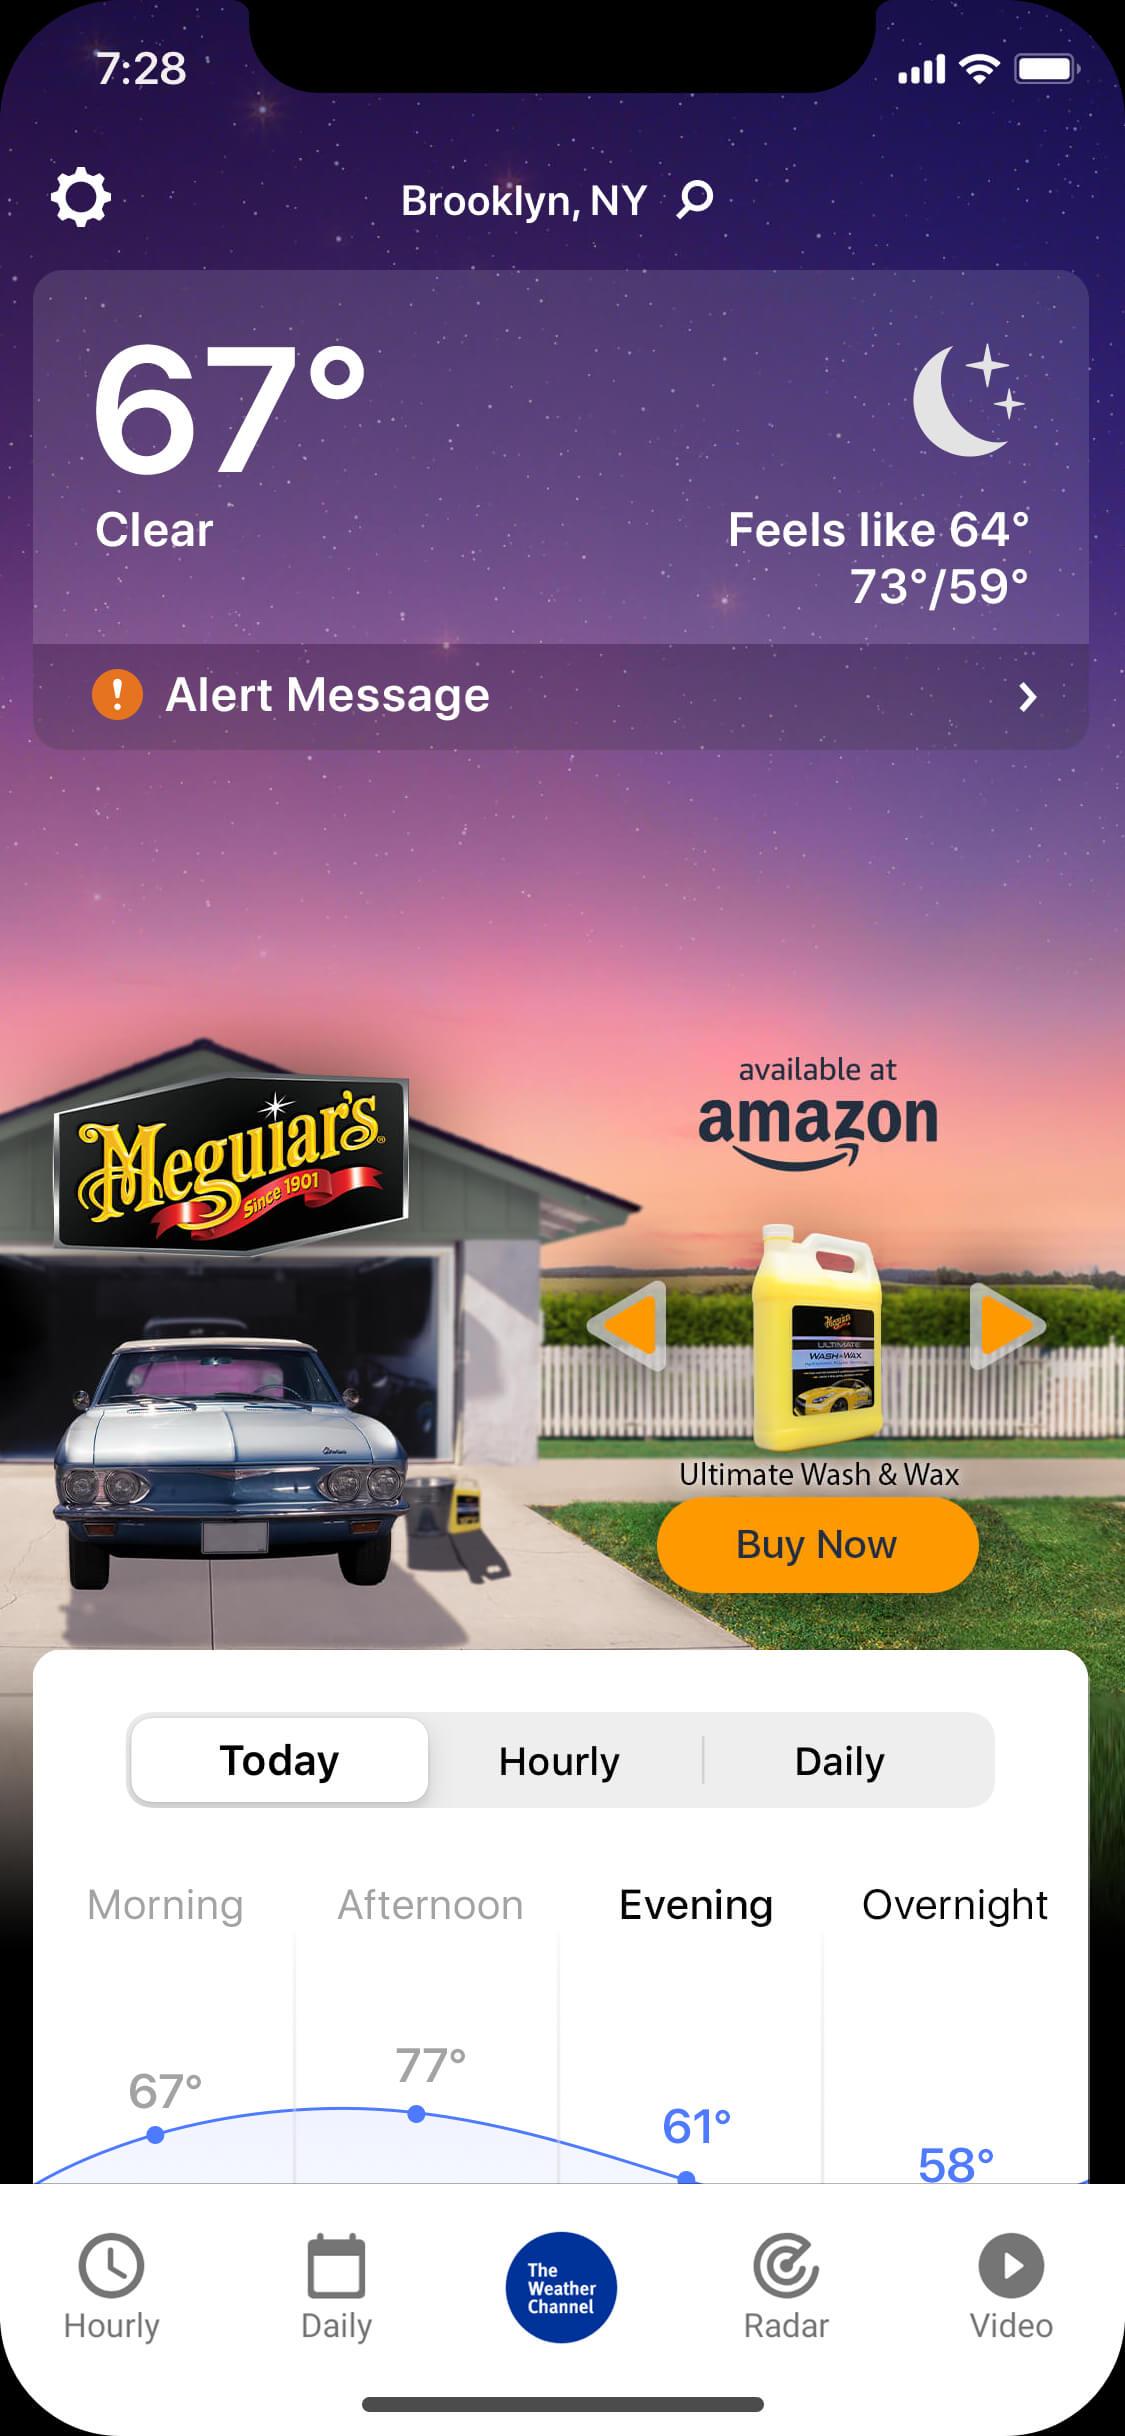 Amazon-Meguiar's-MAIM-Carousel_clear_night